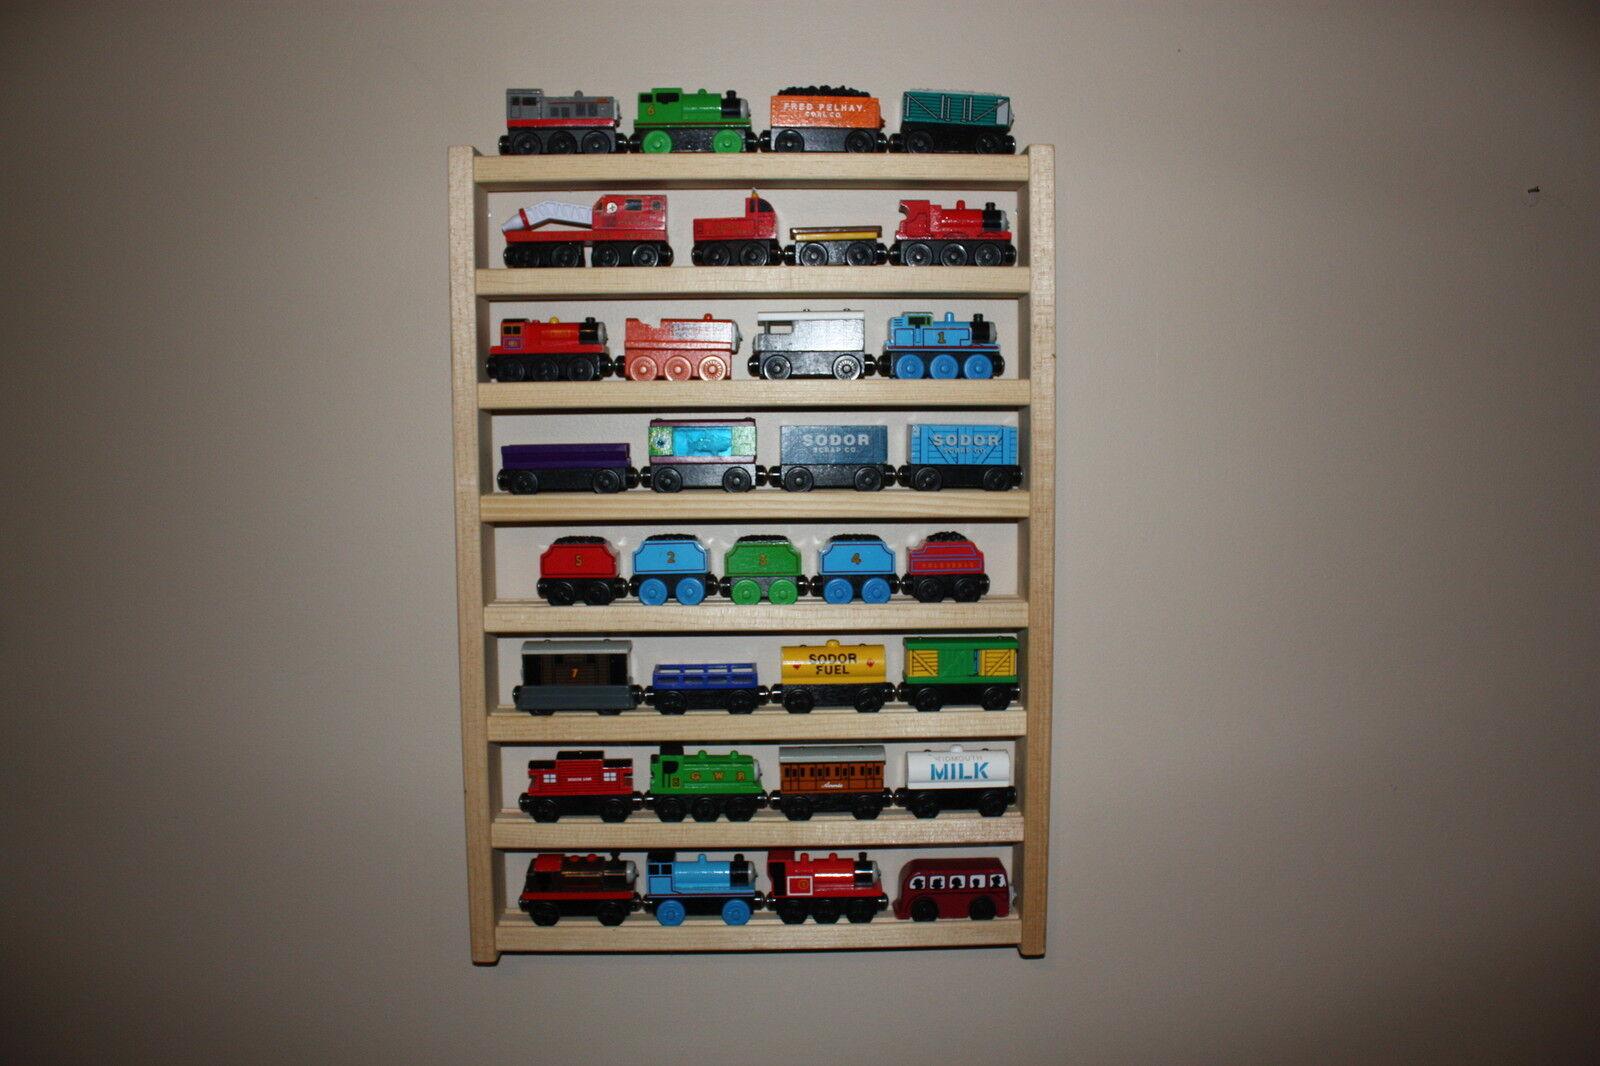 DRIE Train Rack TALLThomas Vrienden tonen opslagmuur houten spoorweg